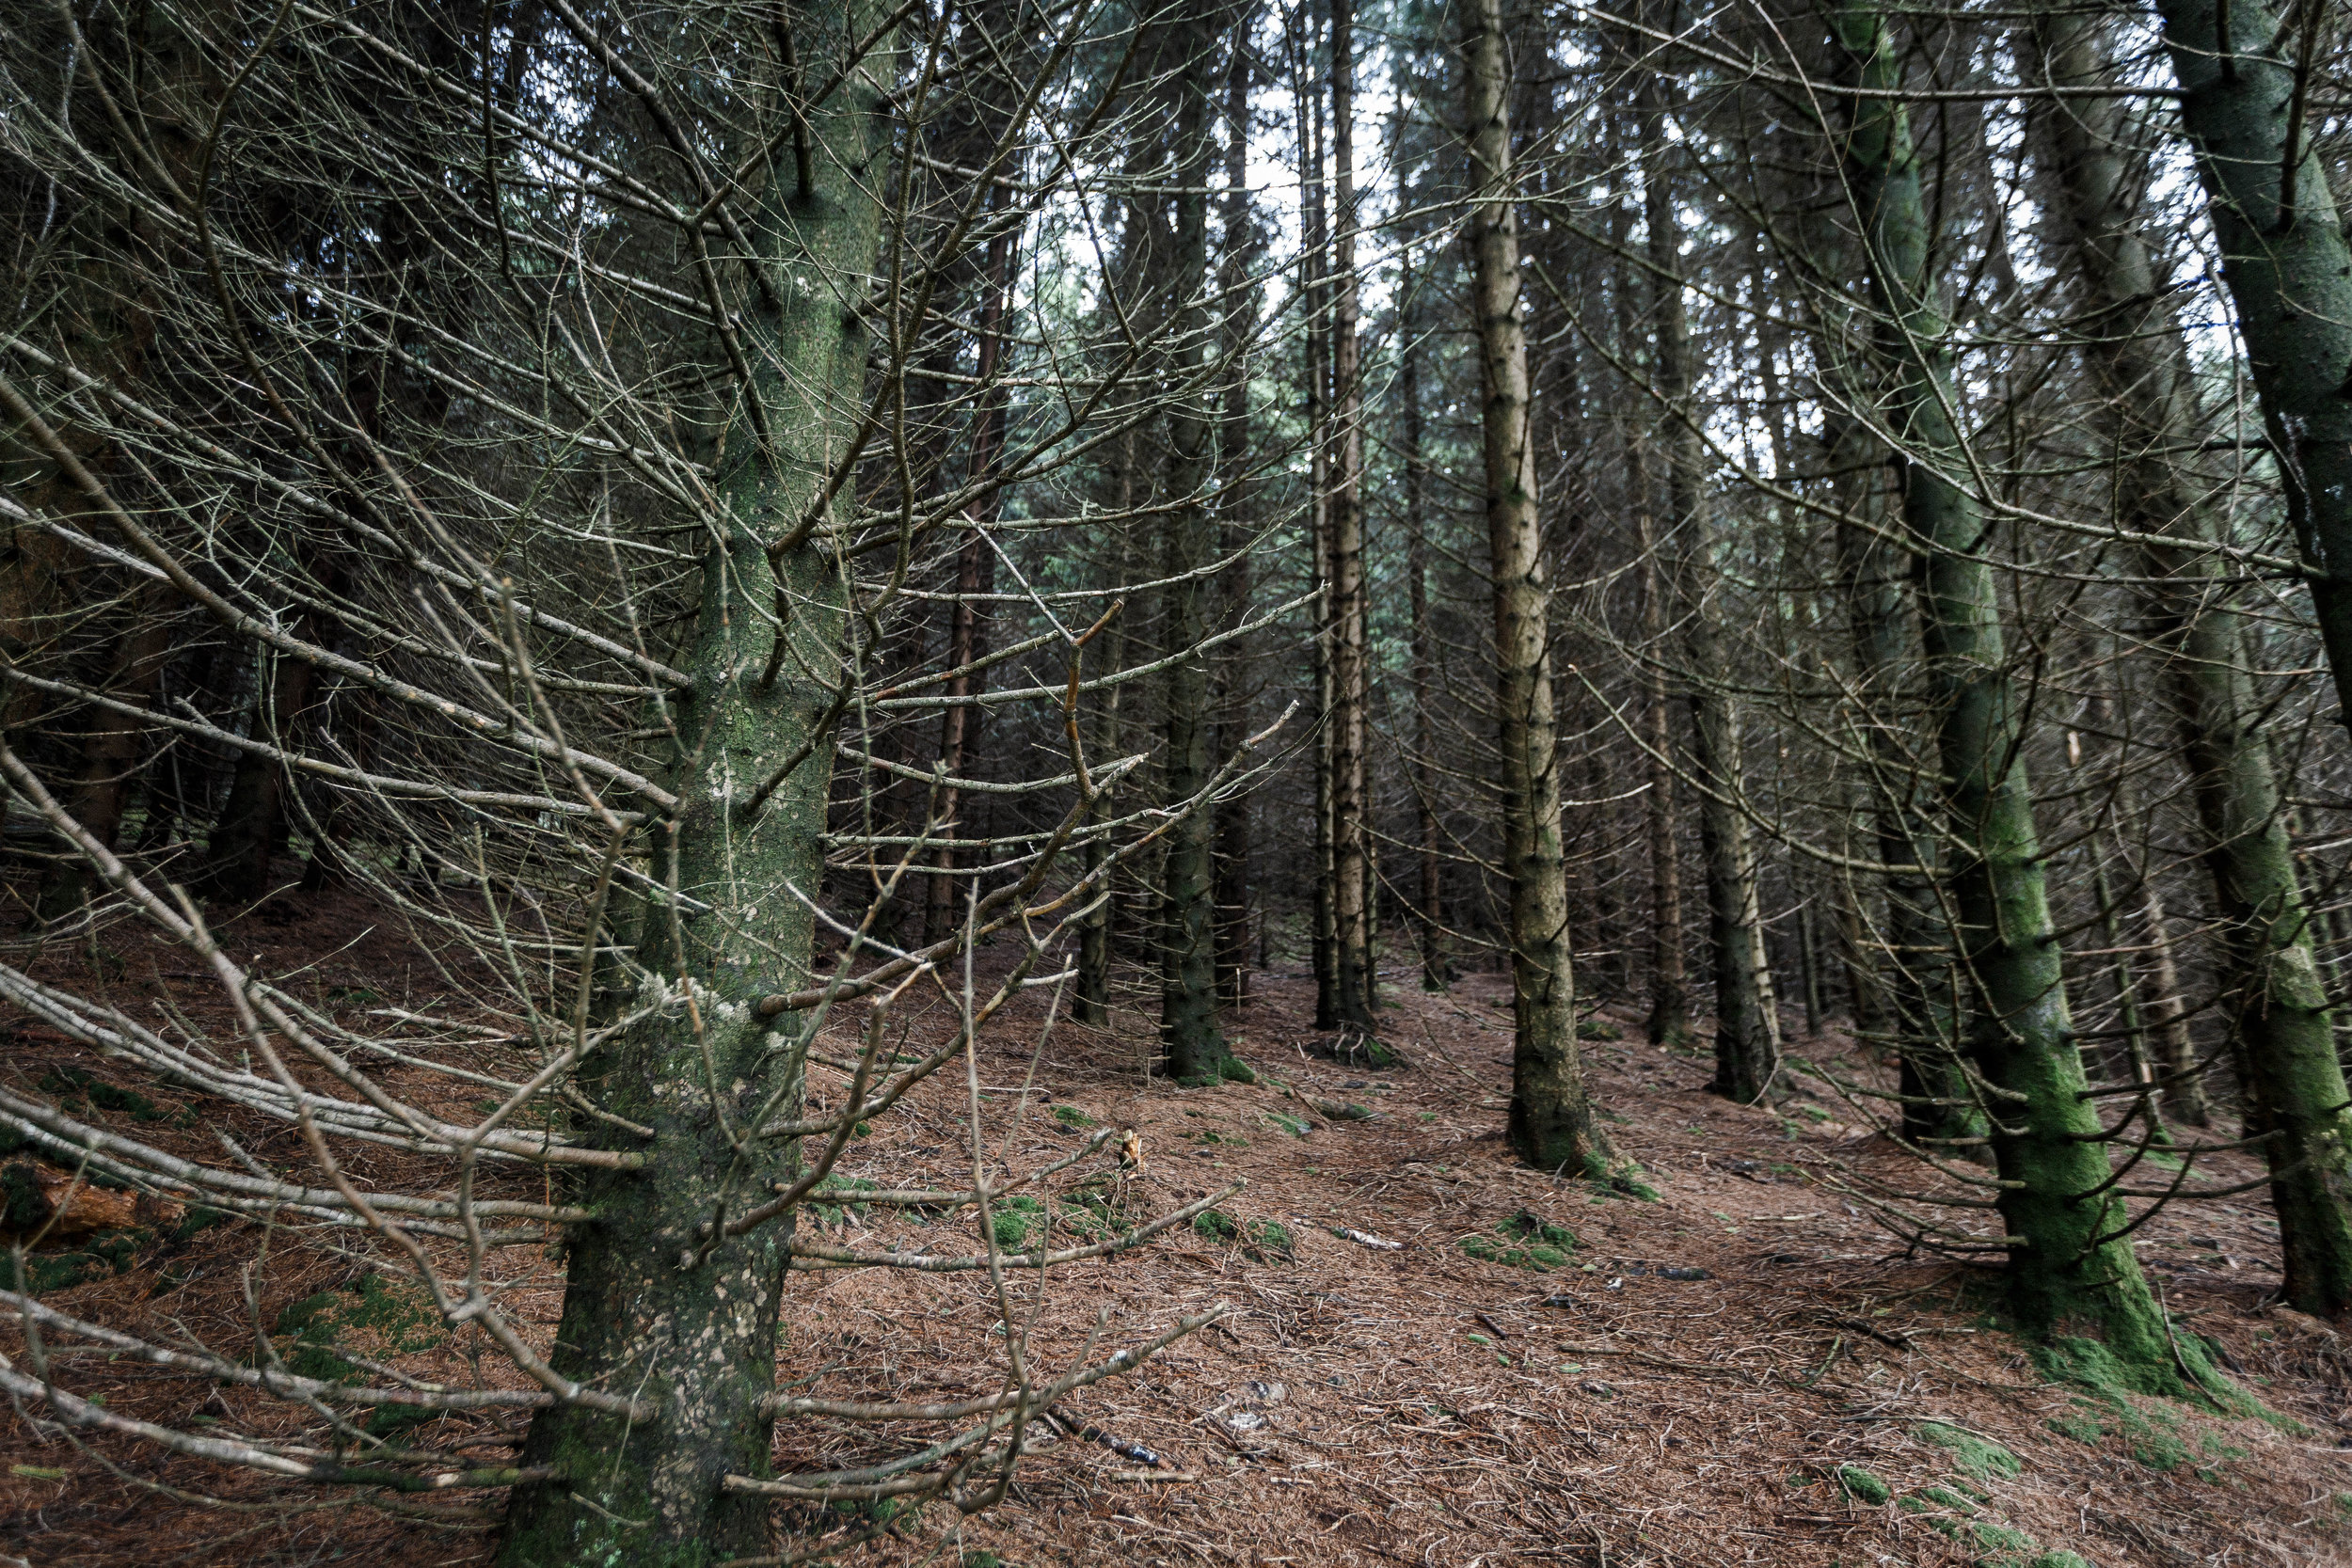 North_forest_18.jpg